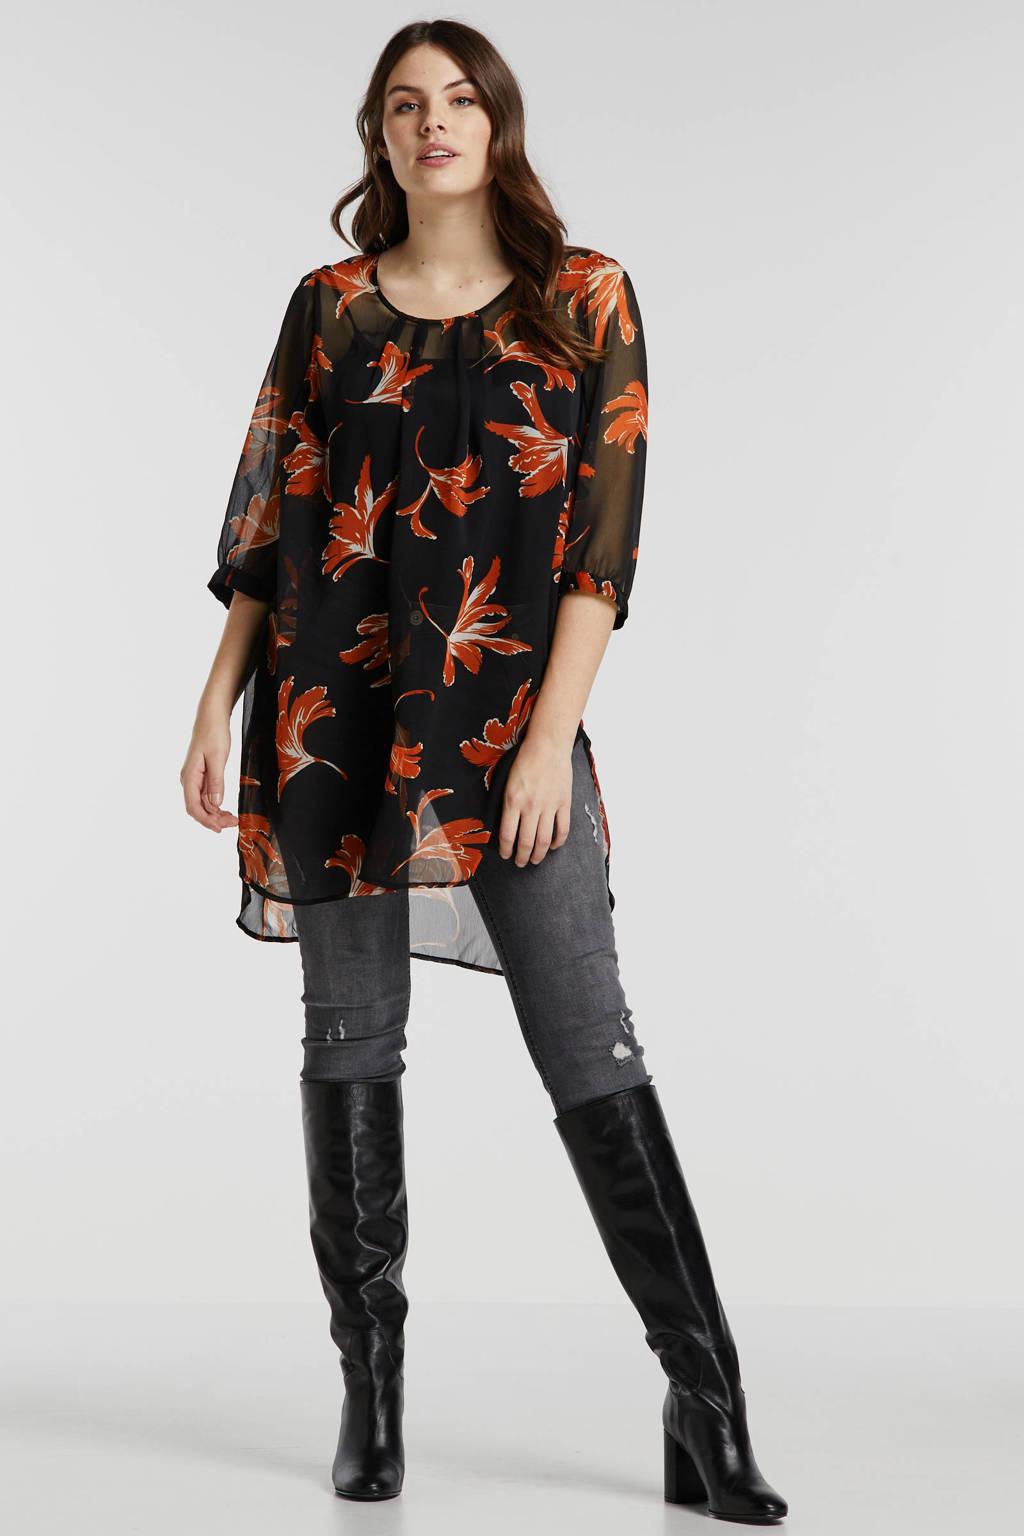 JUNAROSE top met all over print zwart/oranje, Zwart/oranje